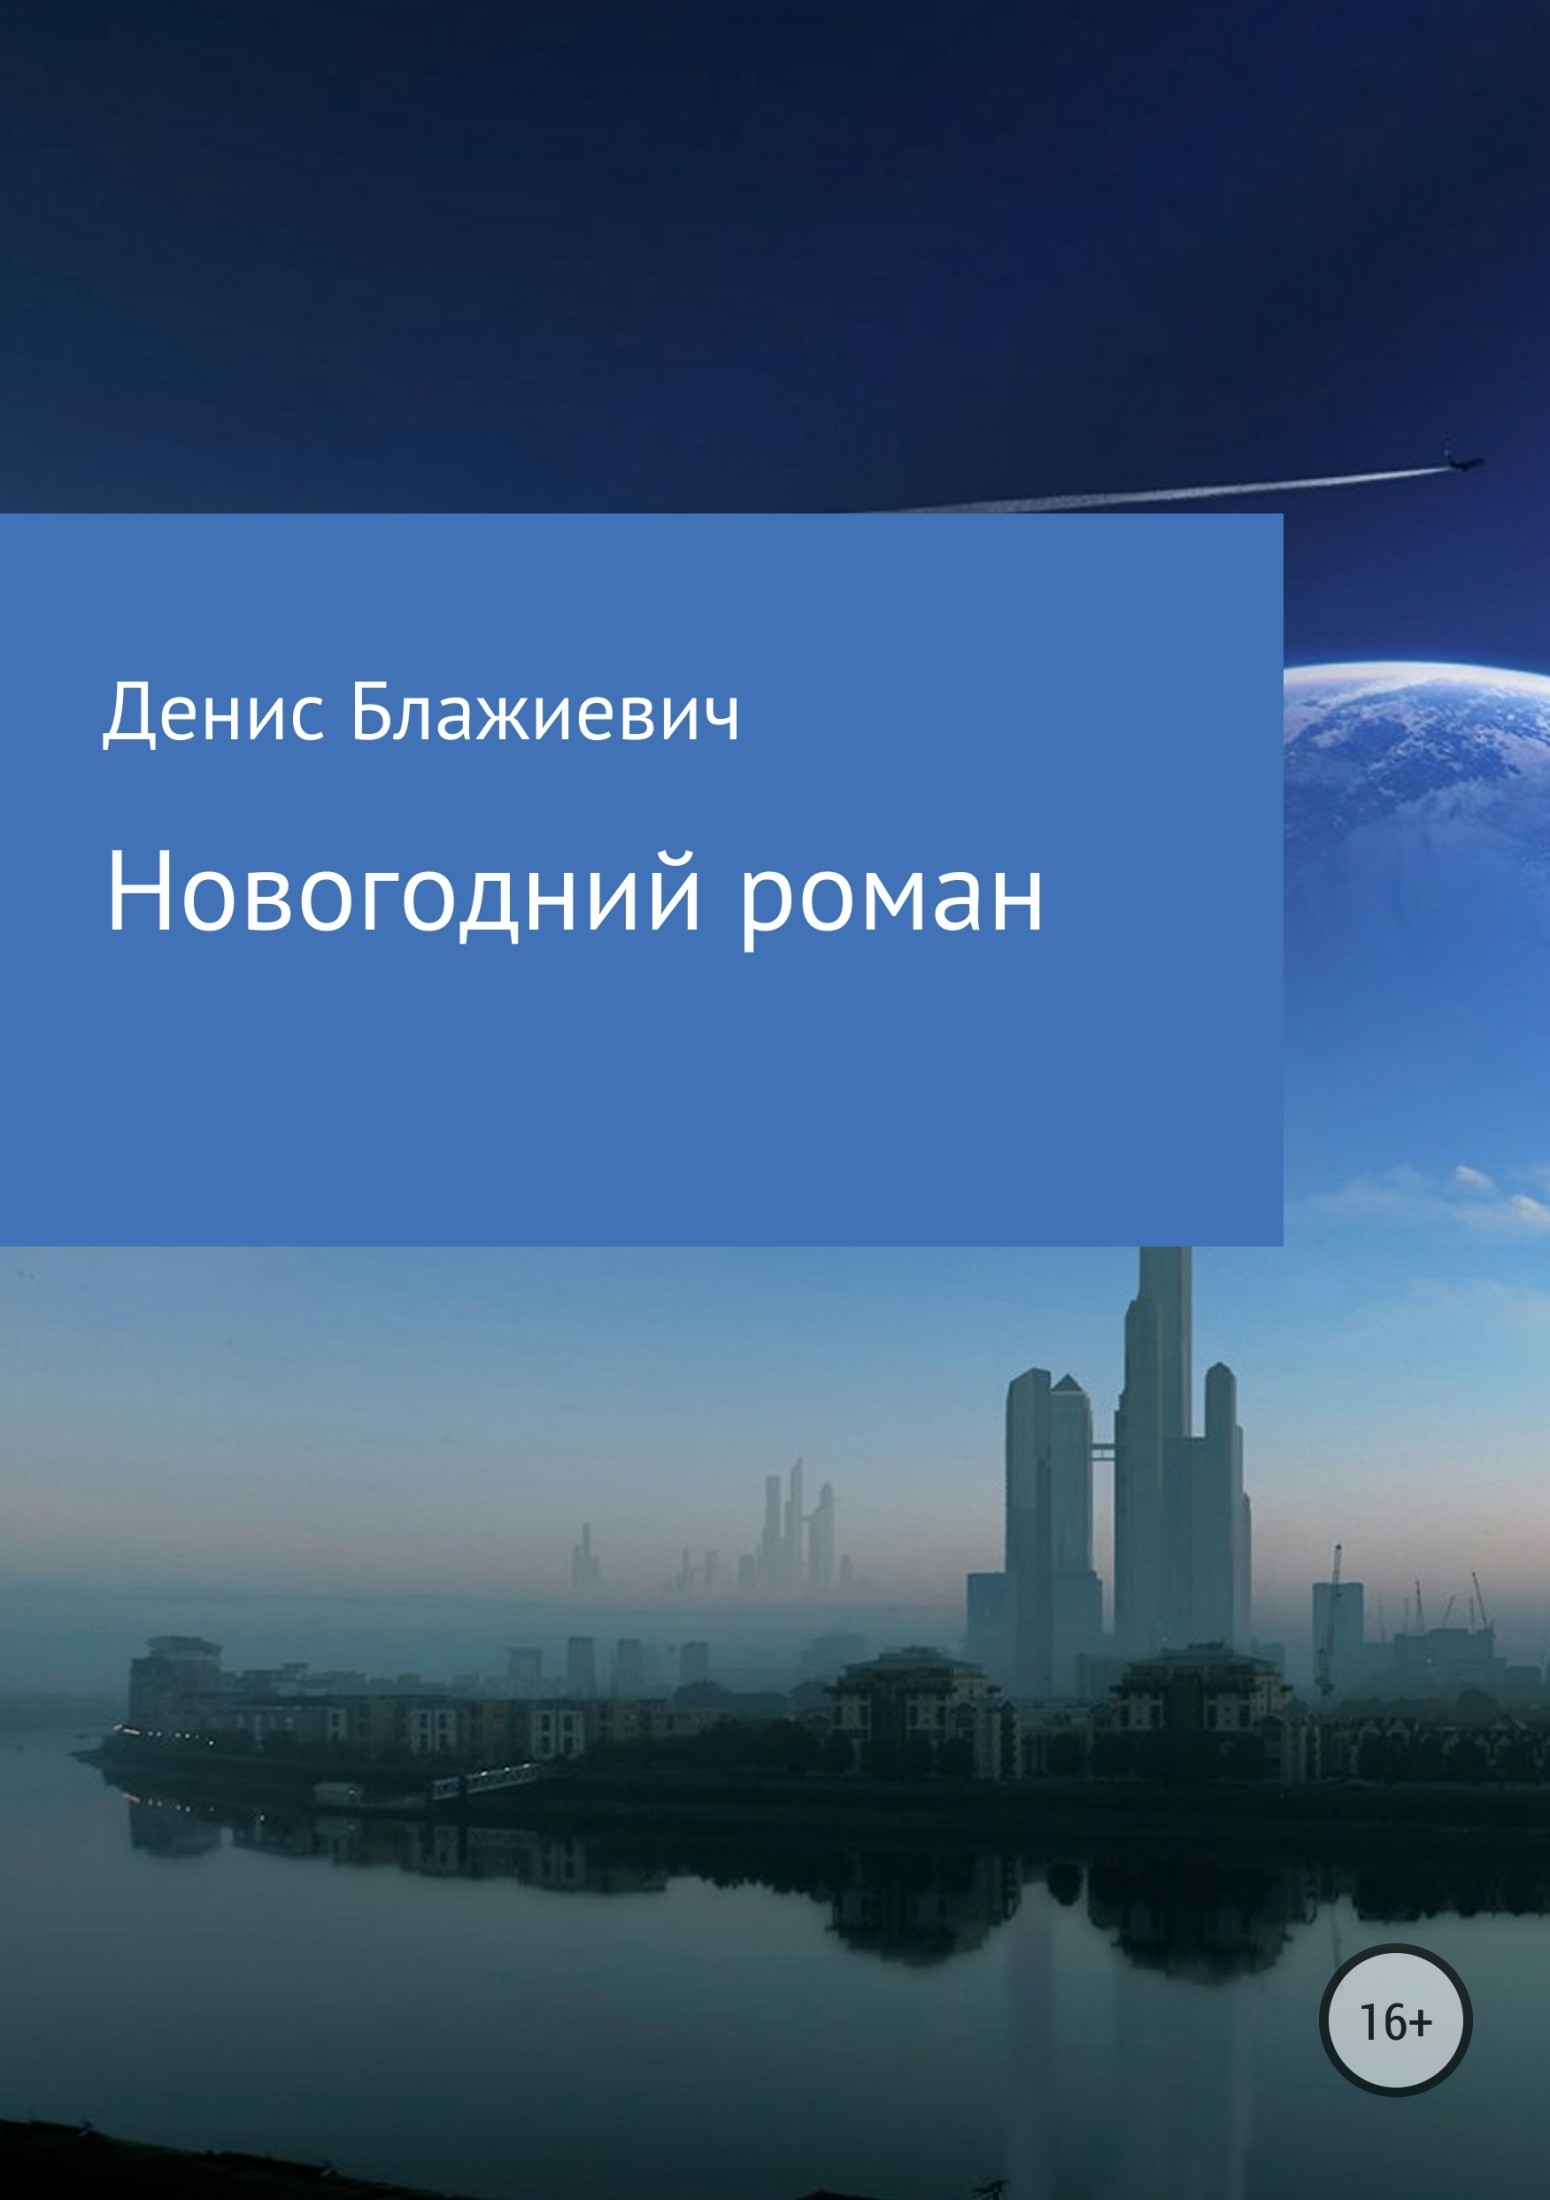 Денис Викторович Блажиевич. Новогодний роман